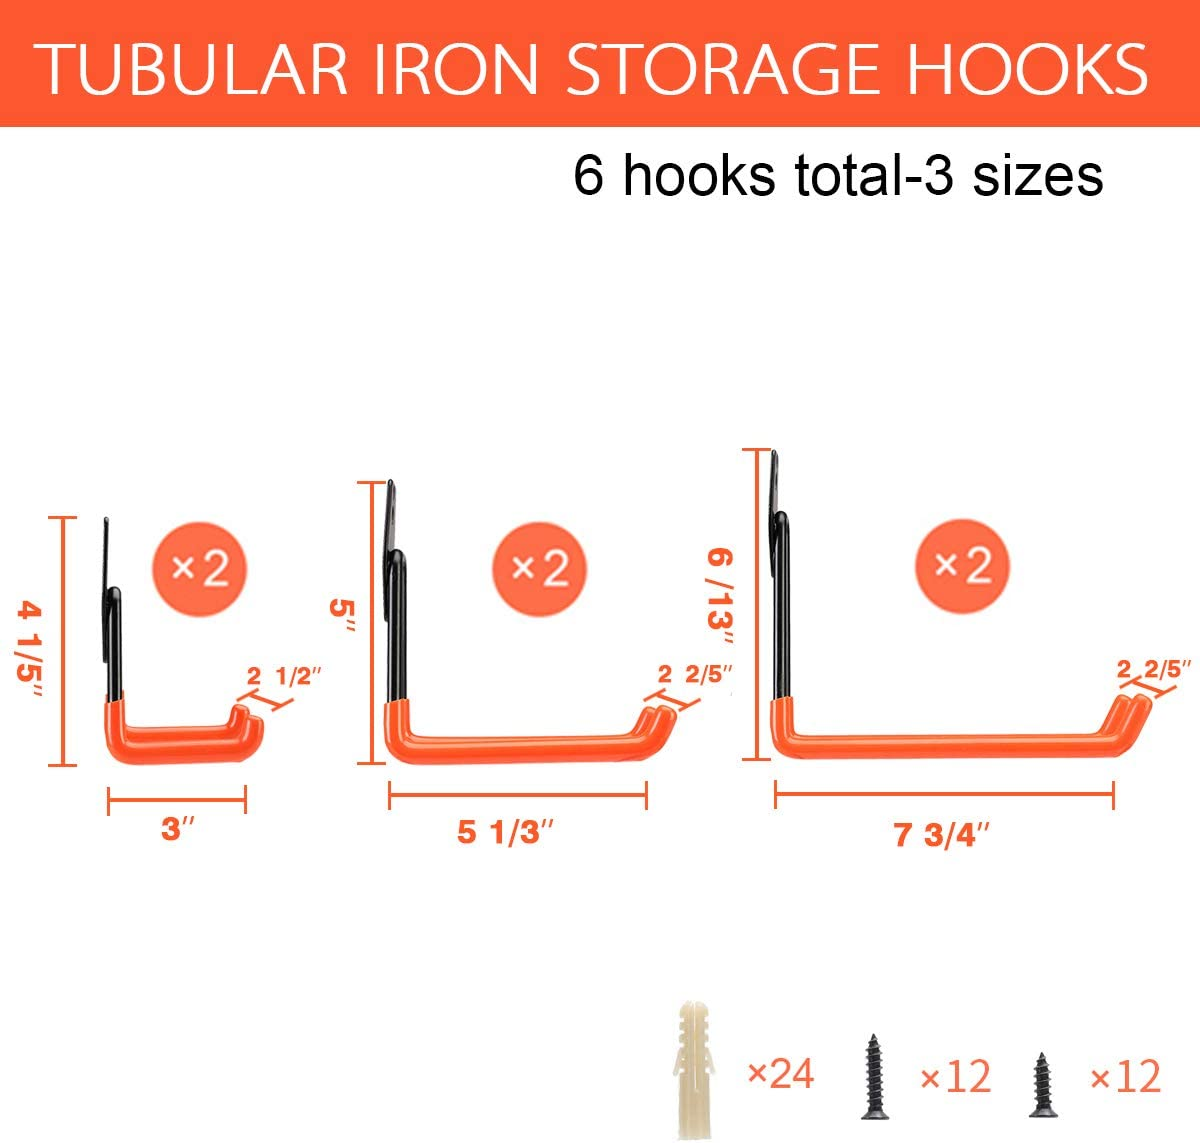 4 Pack, Orange Wall Mount Garage Hanger /& Organizer Ihomepark Heavy Duty Garage Storage Utility Hooks for Ladders /& Tools Tool Holder U Hook with Anti-Slip Coating